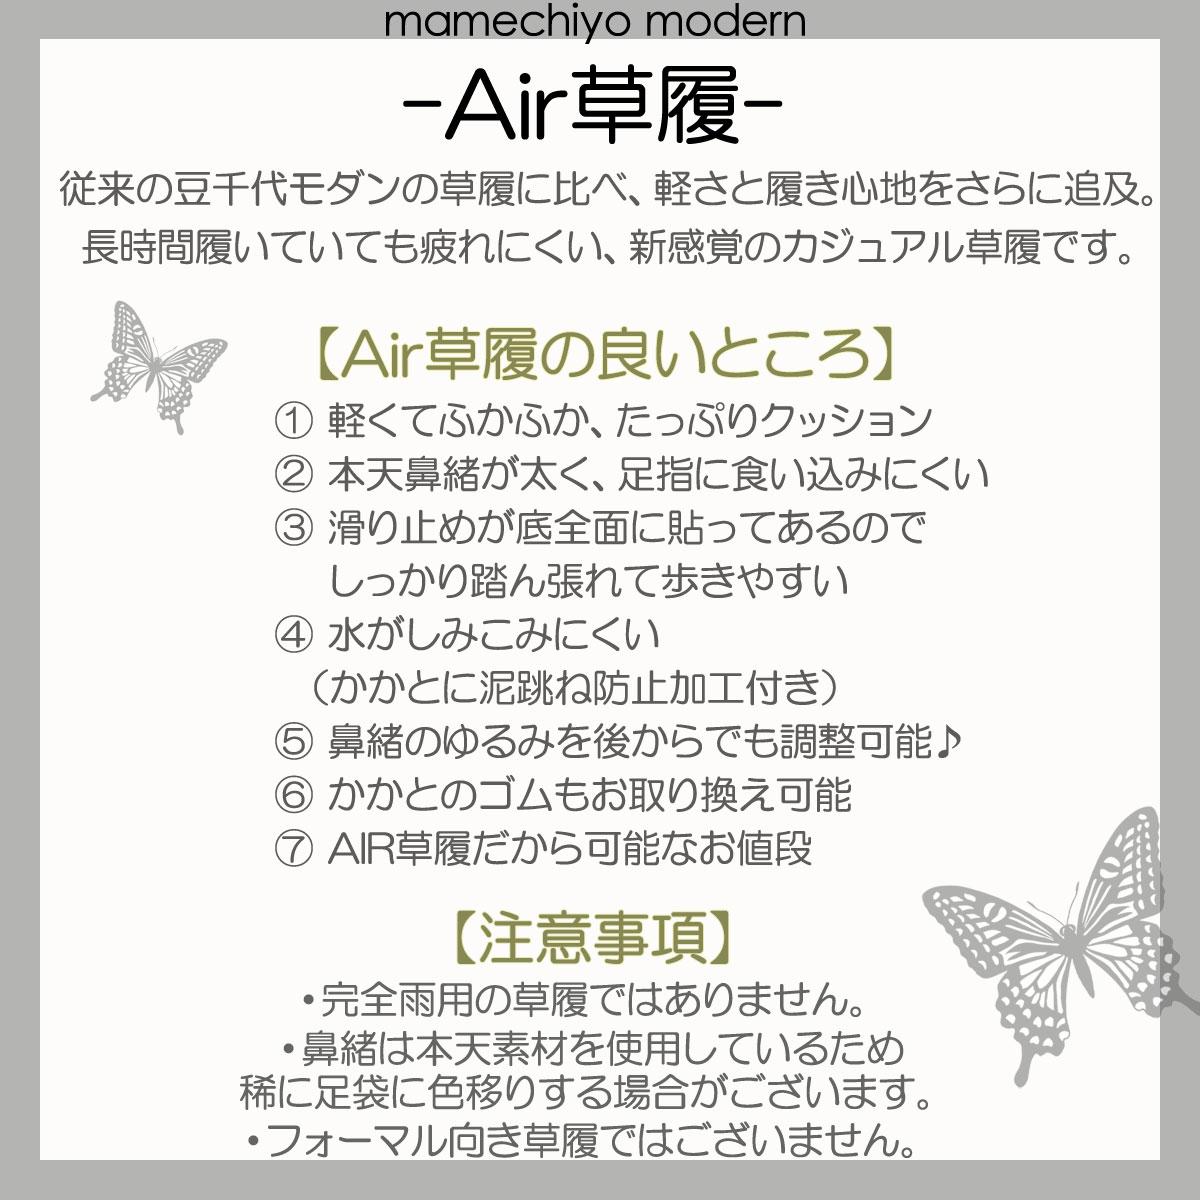 AIR草履 レディ*バタフライ白 福林タイプ深紅鼻緒 (S・M・Lサイズ)